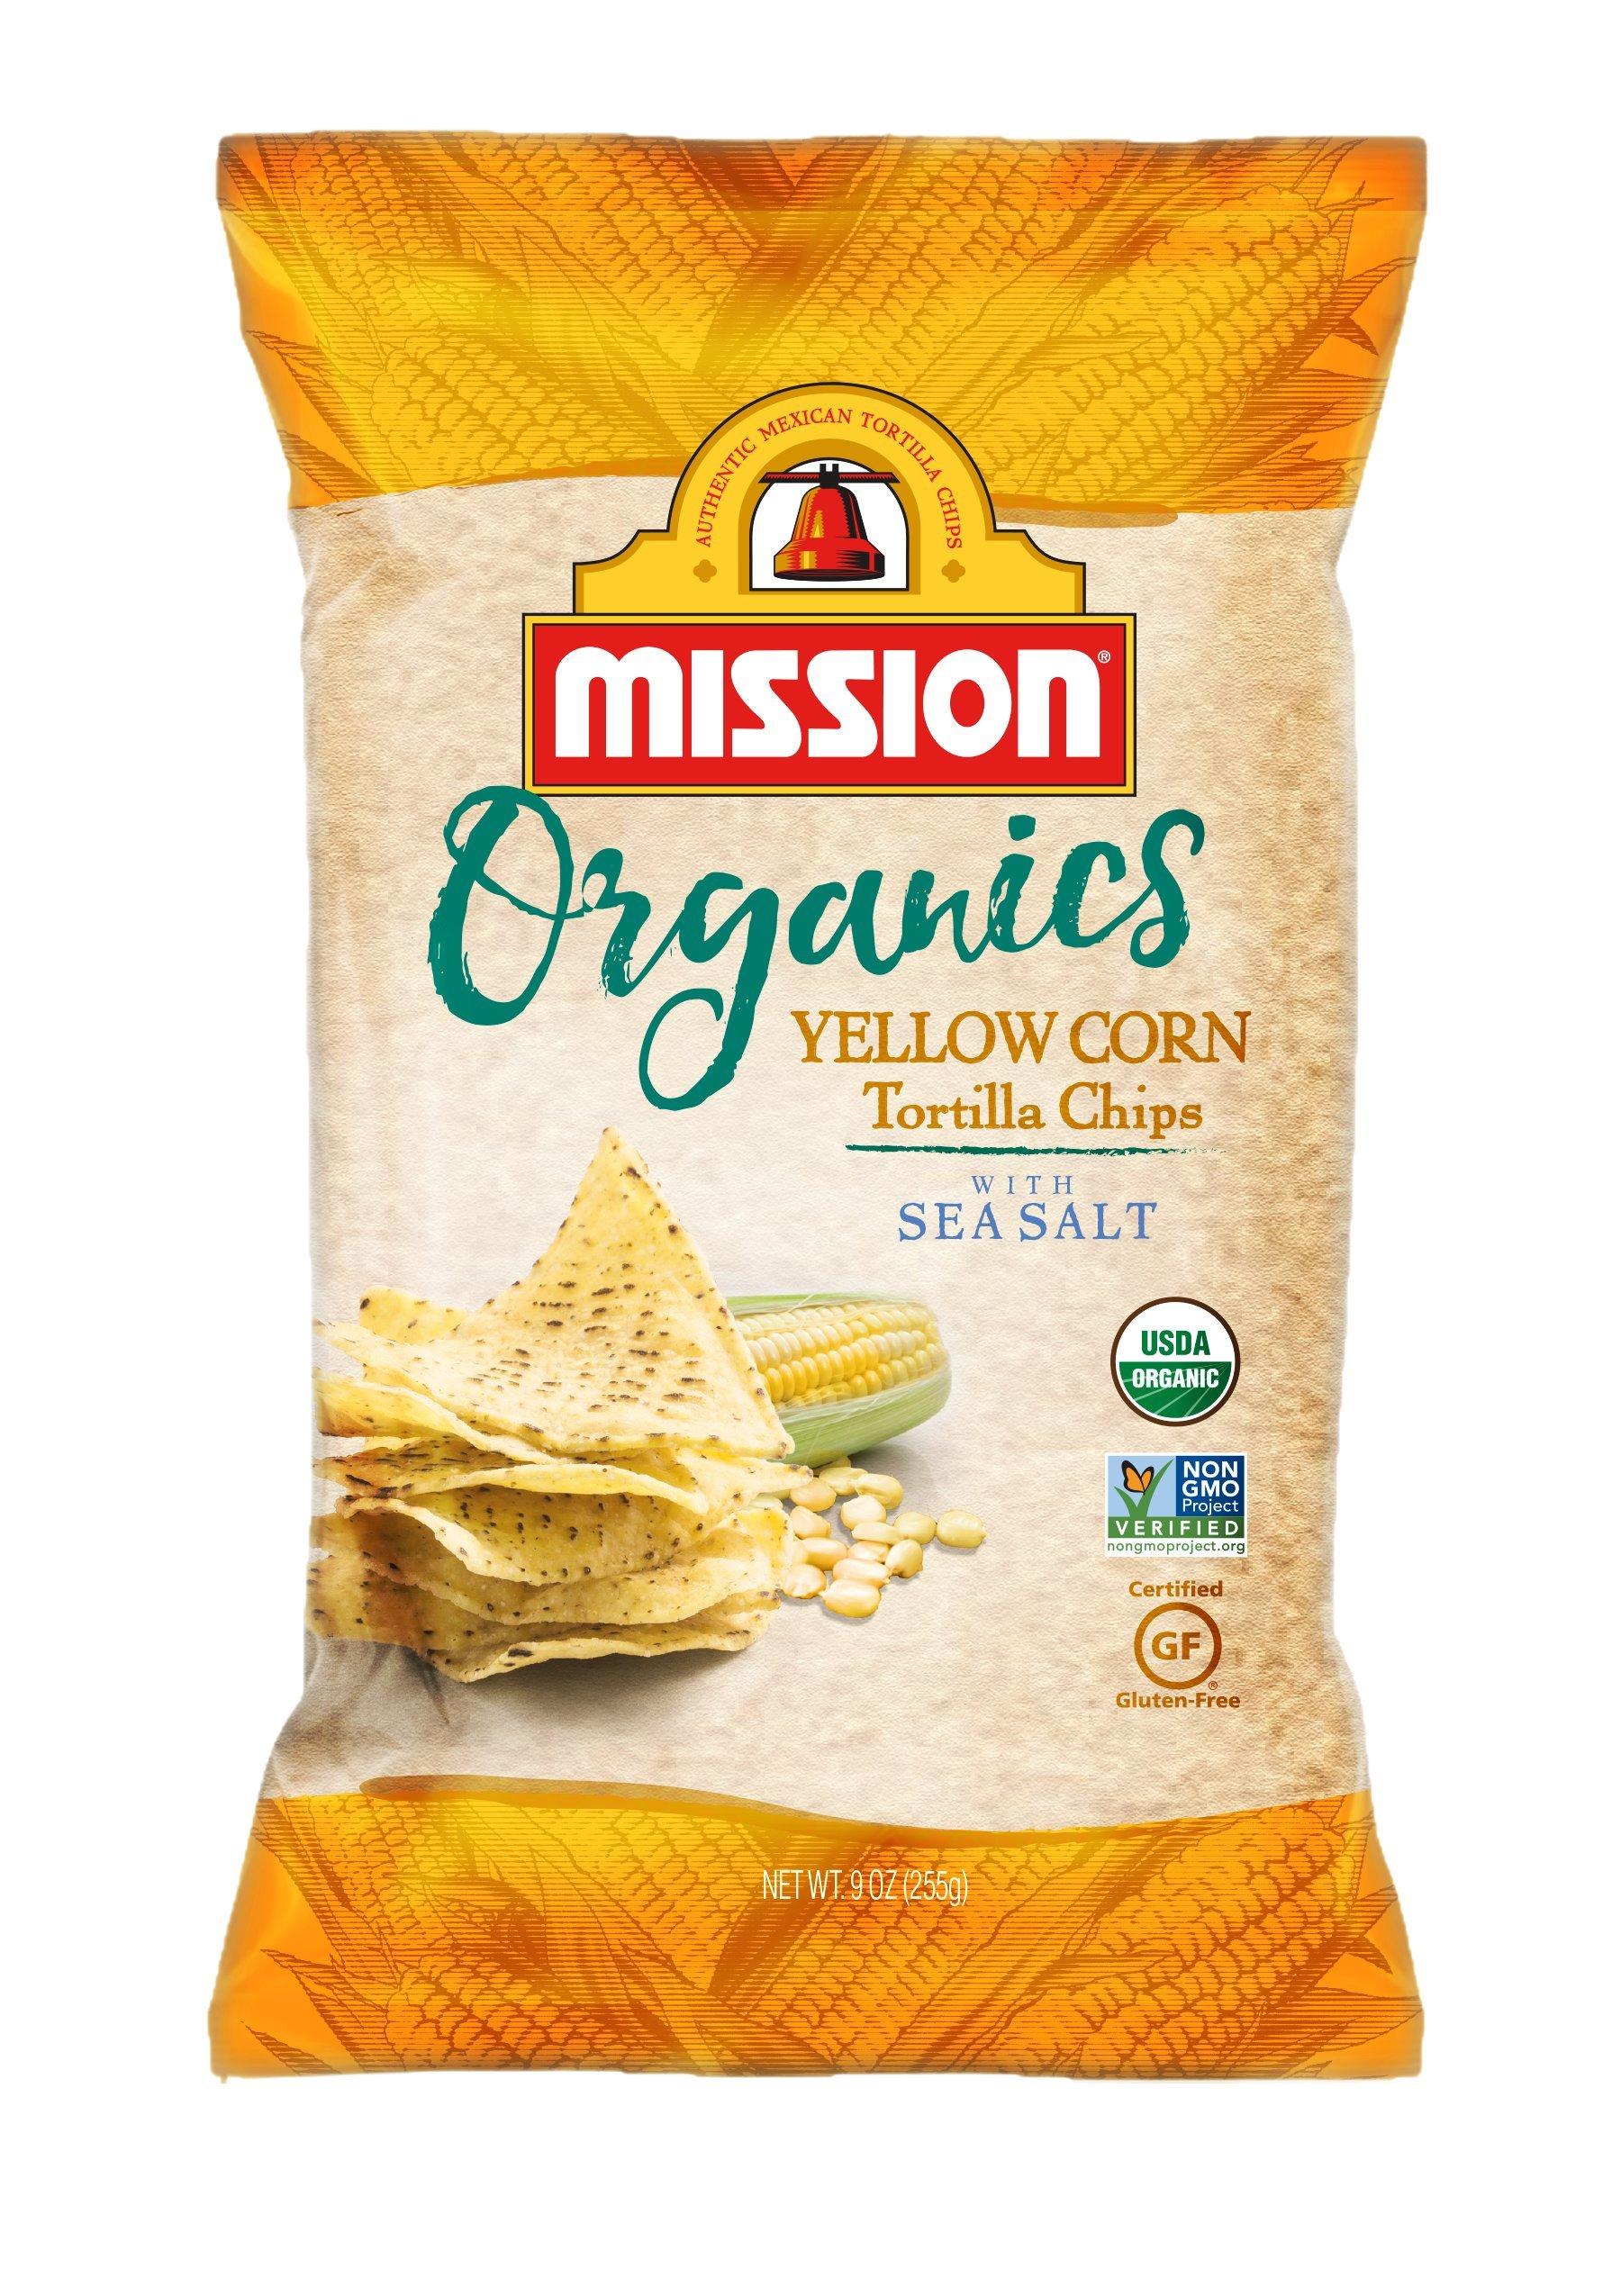 Mission Foods Organic Yellow Corn Tortilla Chips, 9 oz